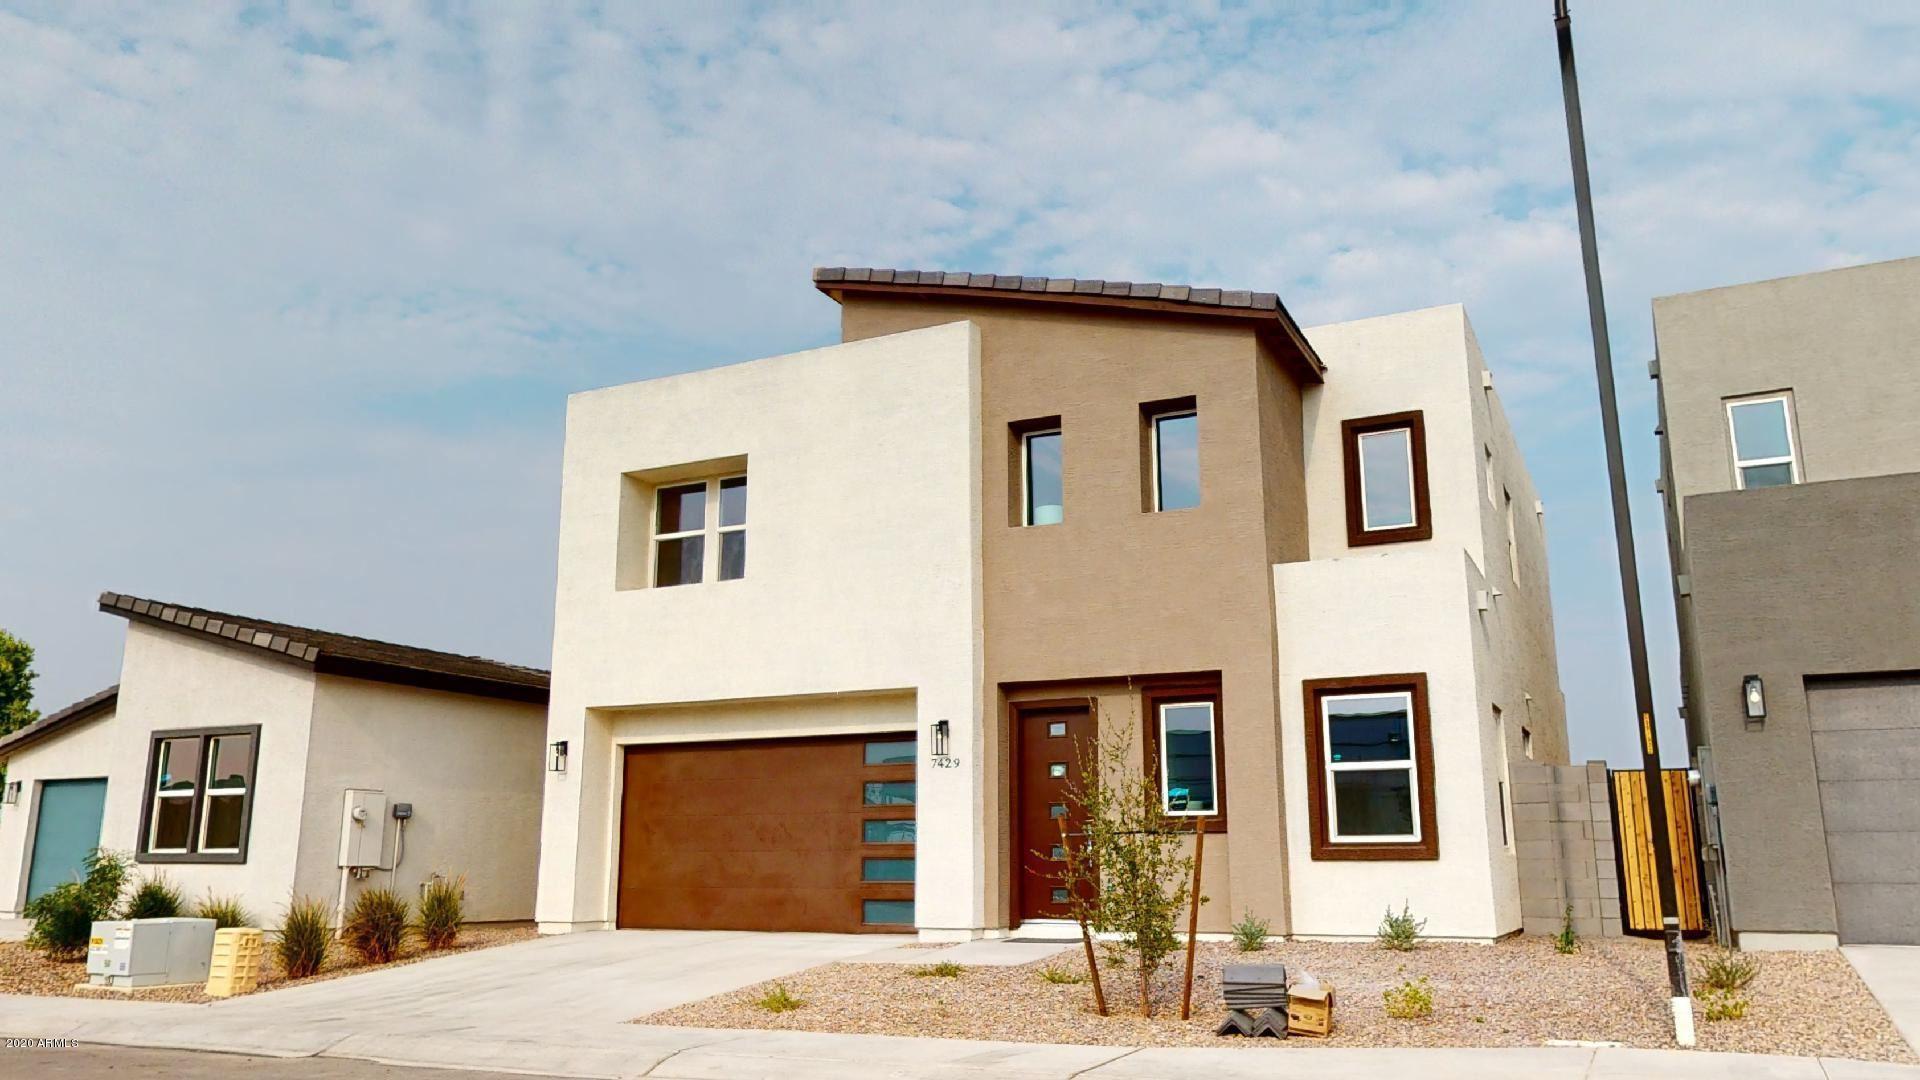 7429 S 23RD Drive, Phoenix, AZ 85041 - MLS#: 6106293